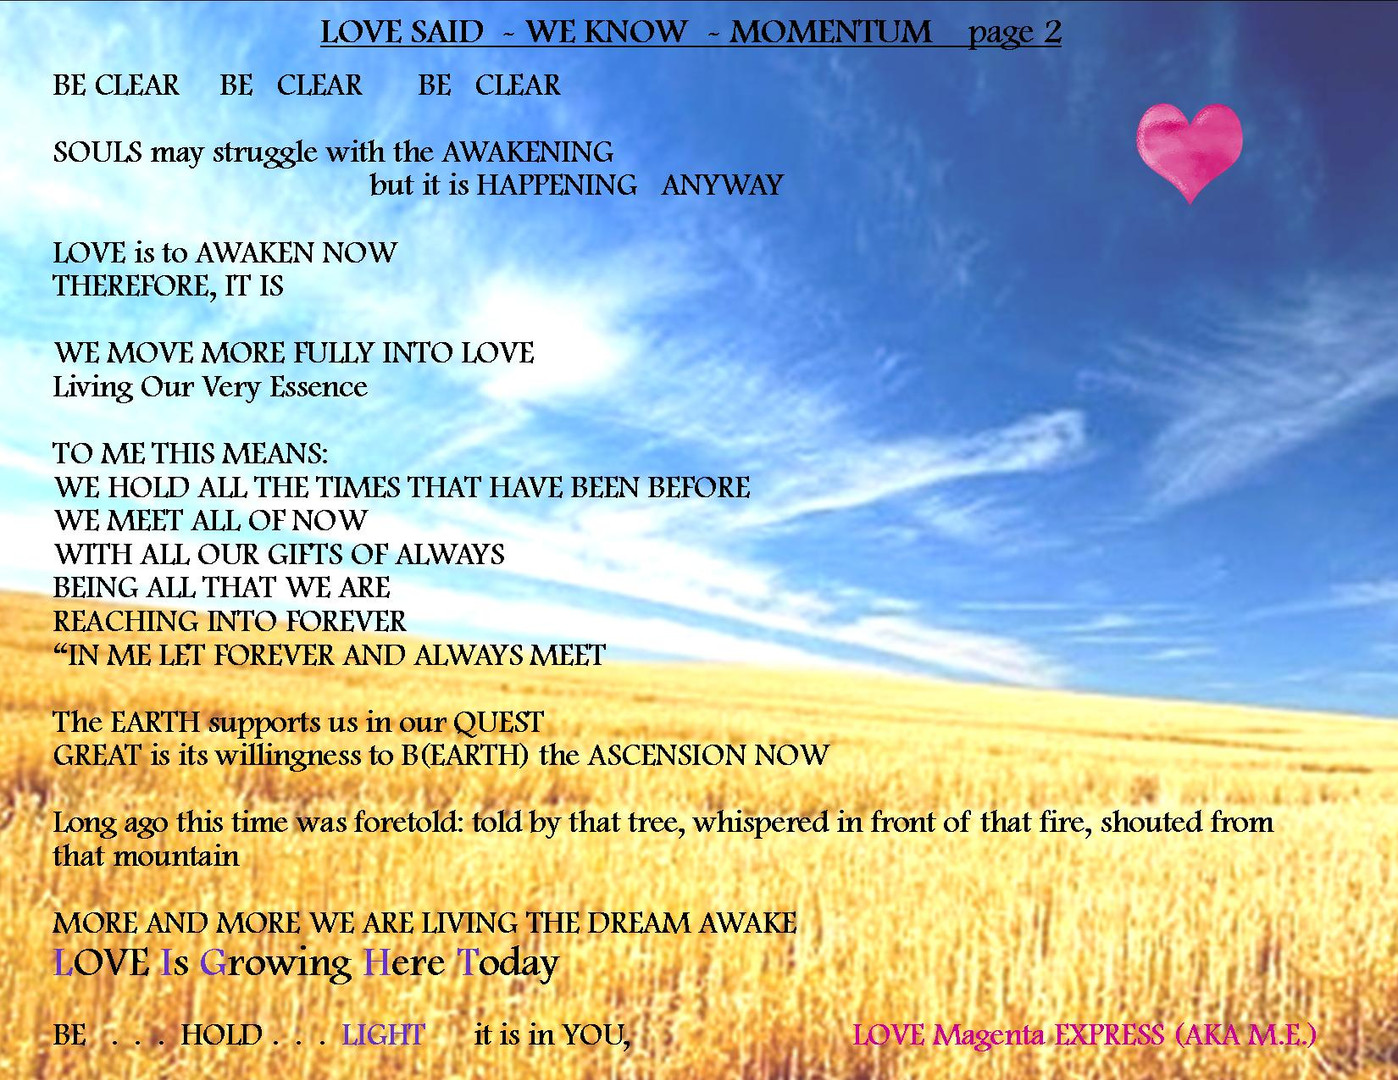 LOVE SAID MOMENTUM 2 PEG.jpg